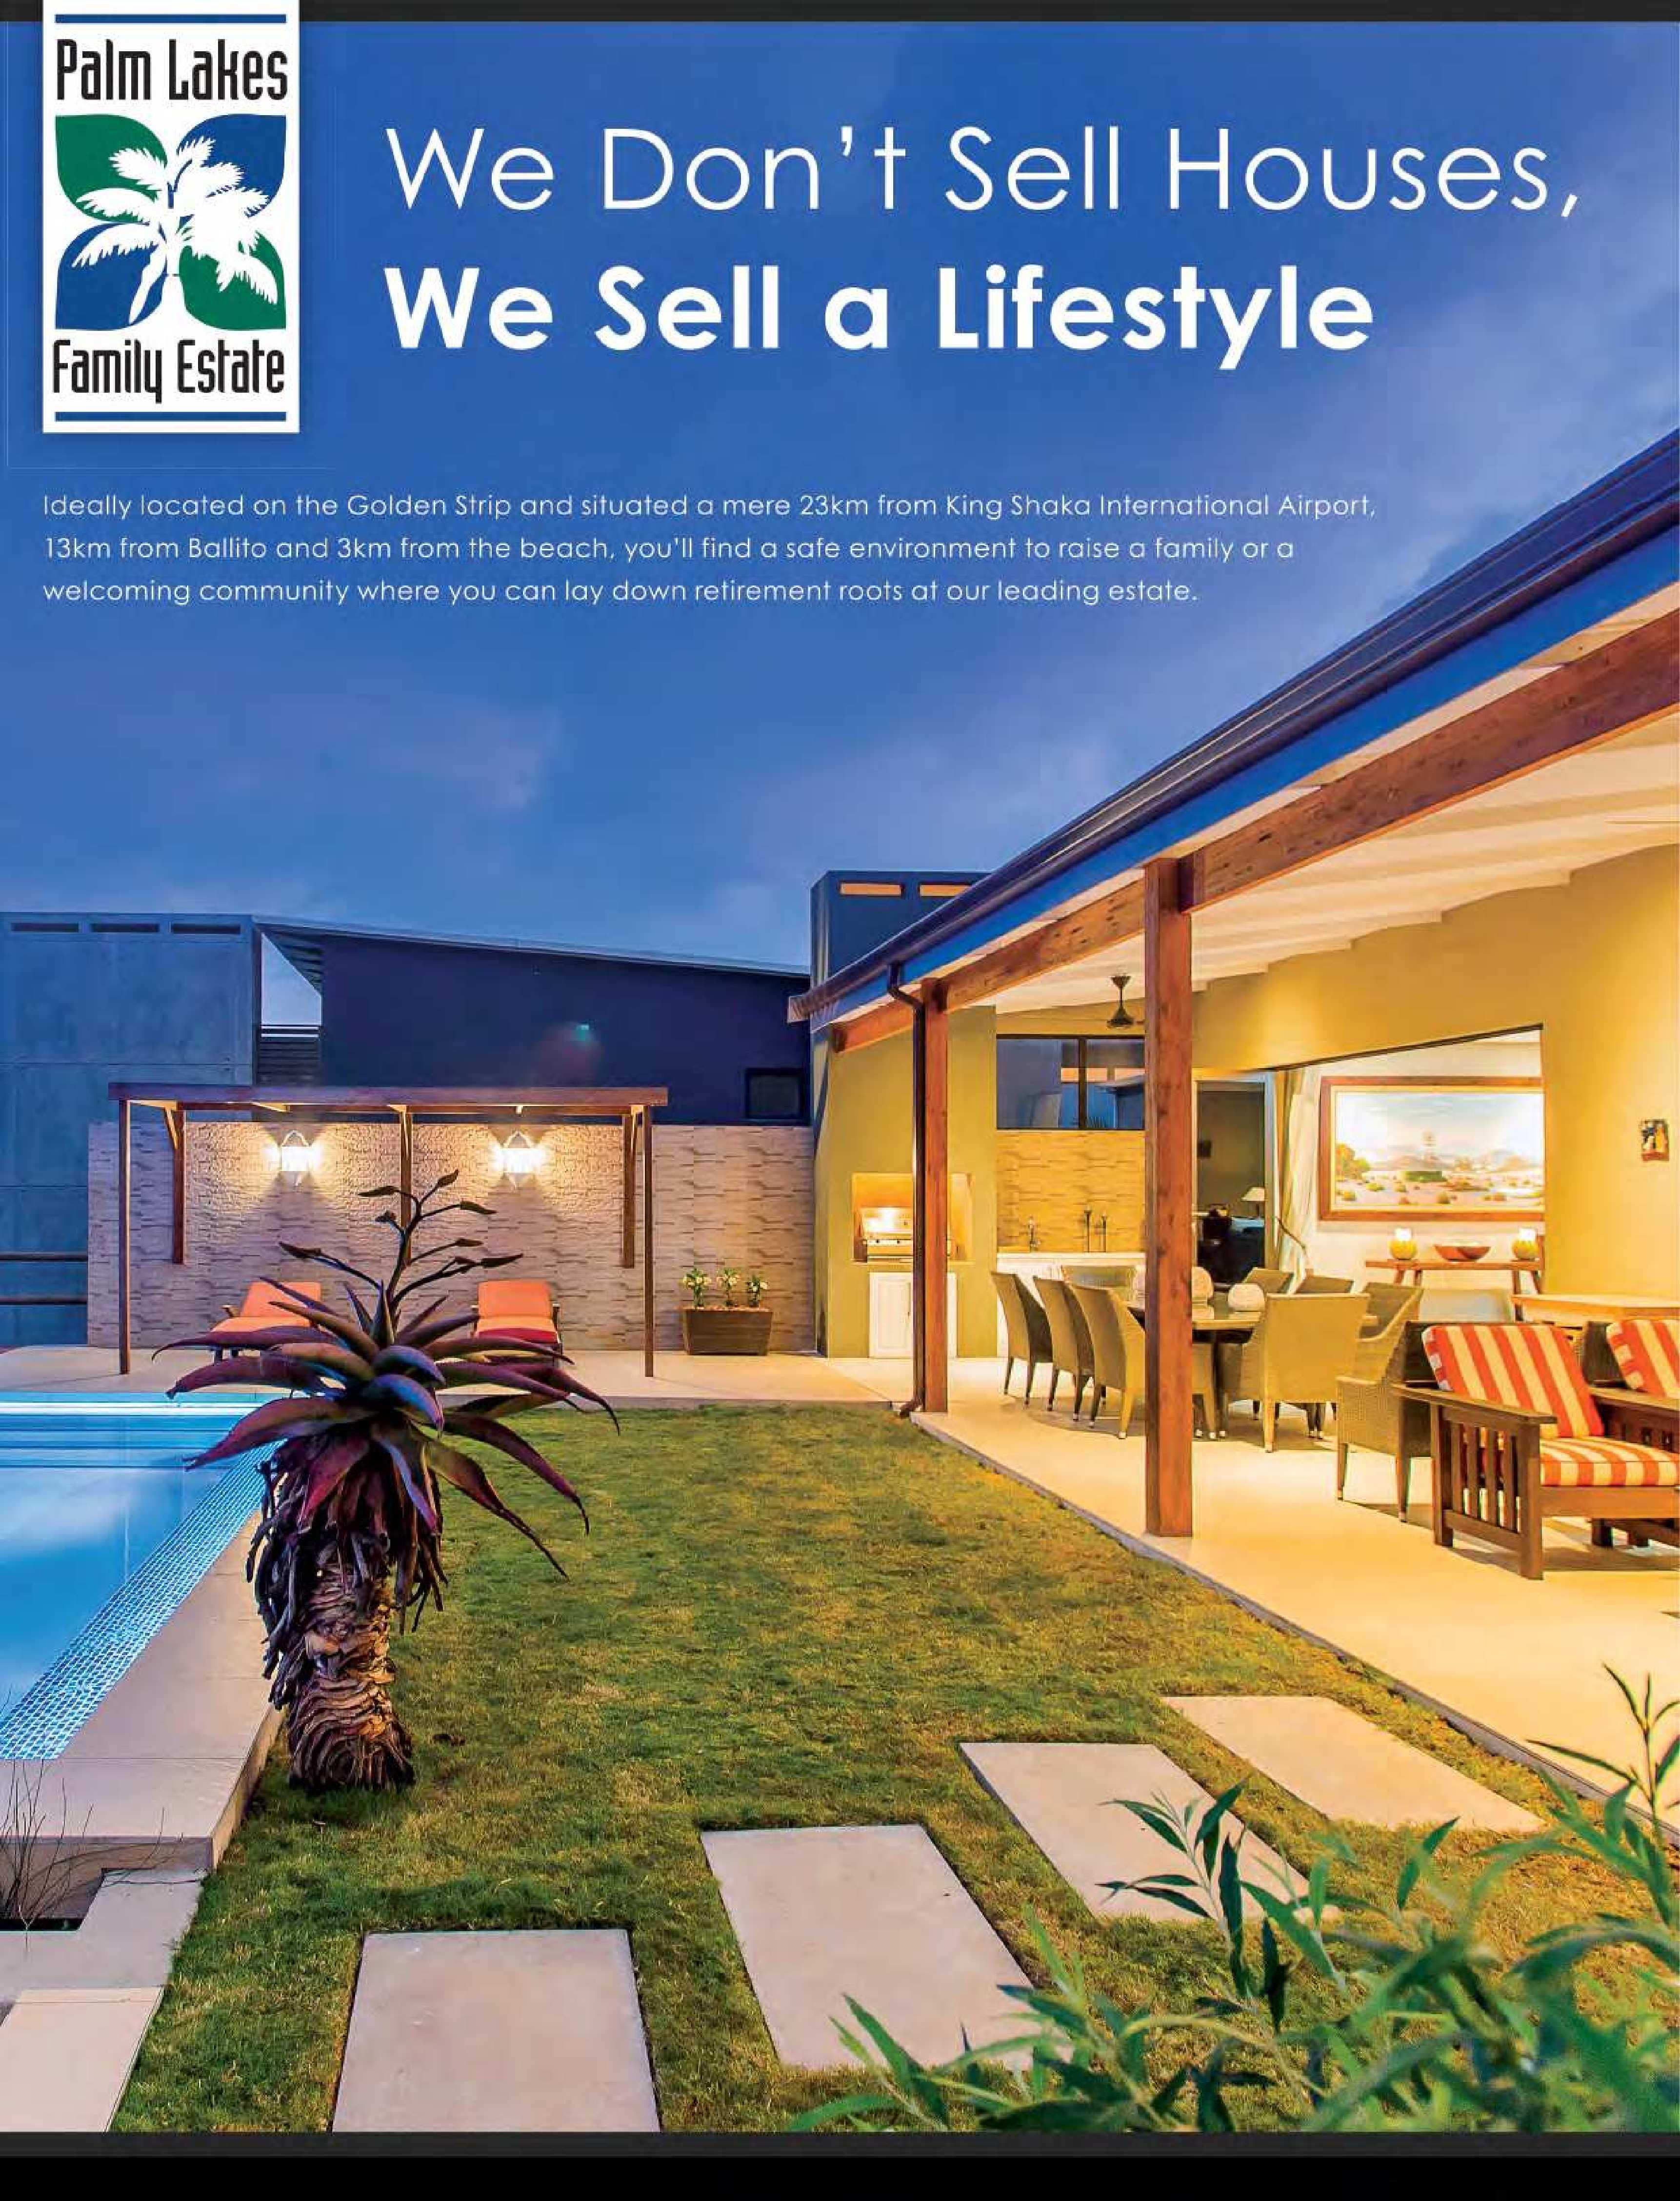 get-magazine-ballitoumhlanga-december-2017-january-2018-2-epapers-page-98